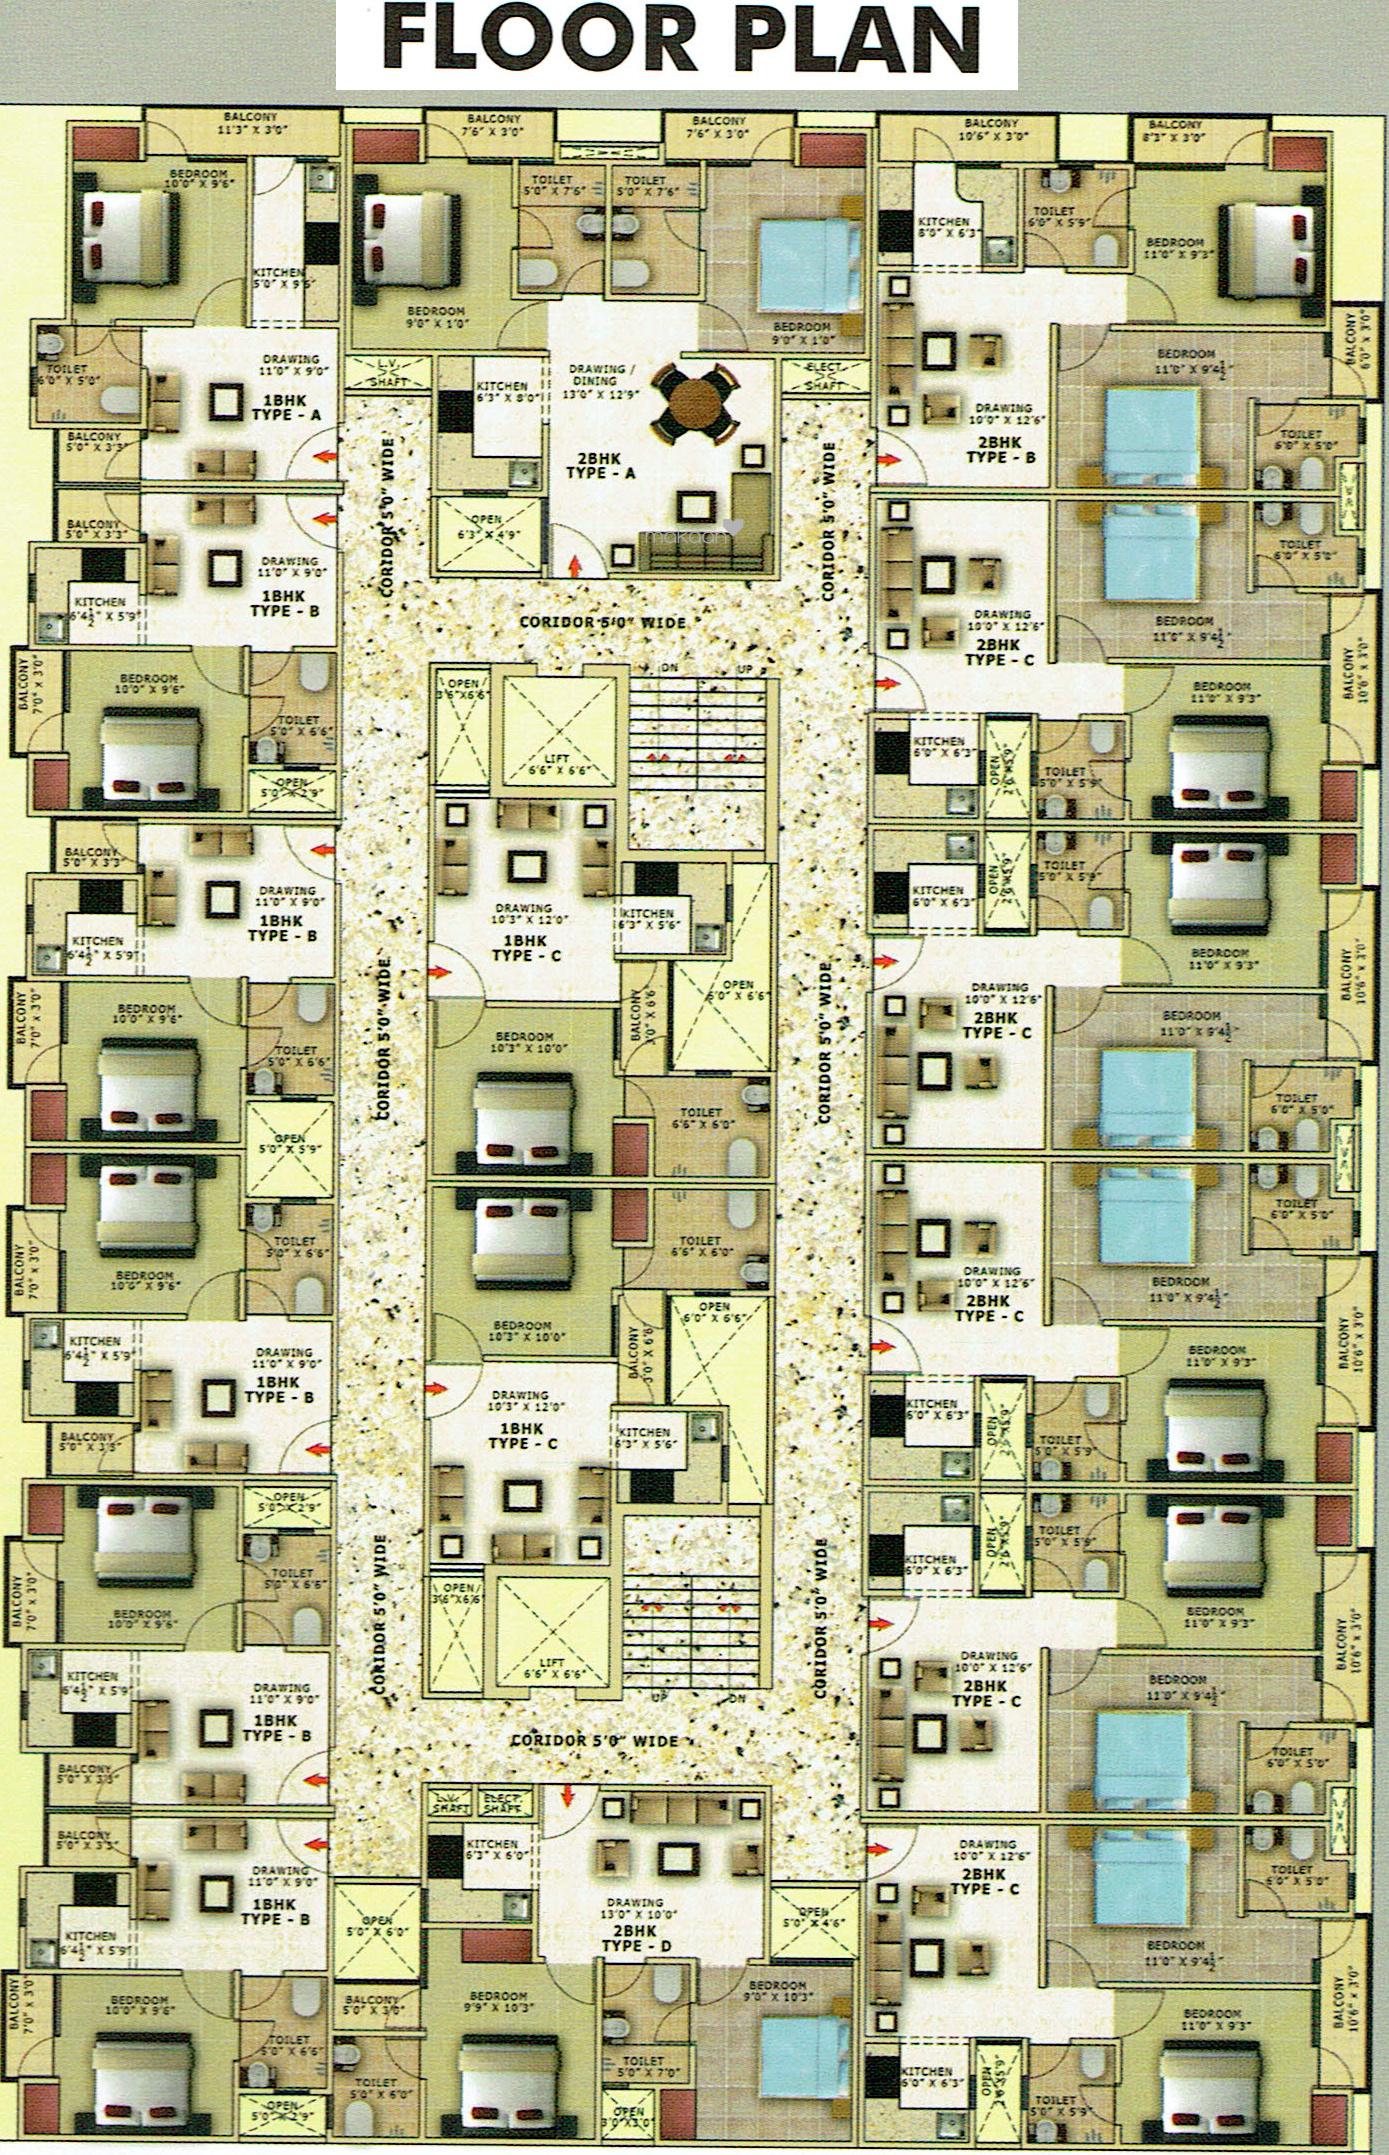 Builders Hi Tech Homes in Sector 104 Noida Flats for Sale in